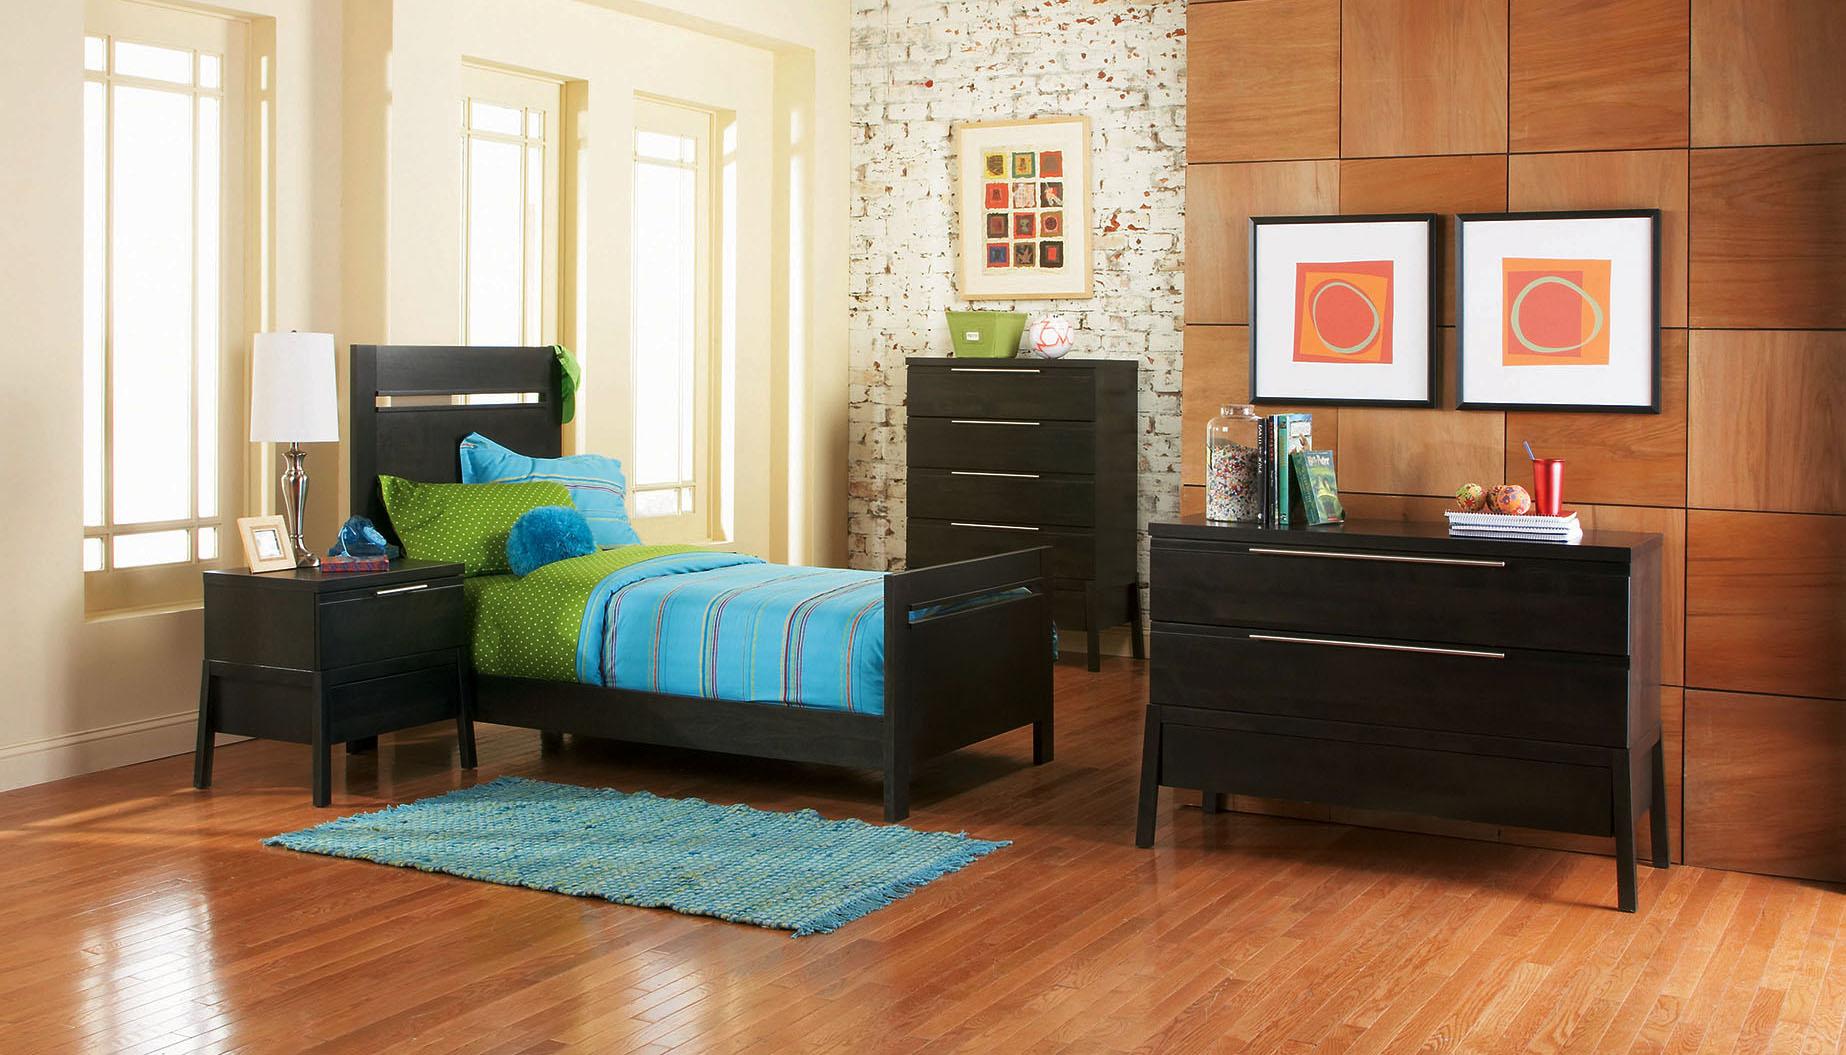 2400-Youth-bedroom small.jpg